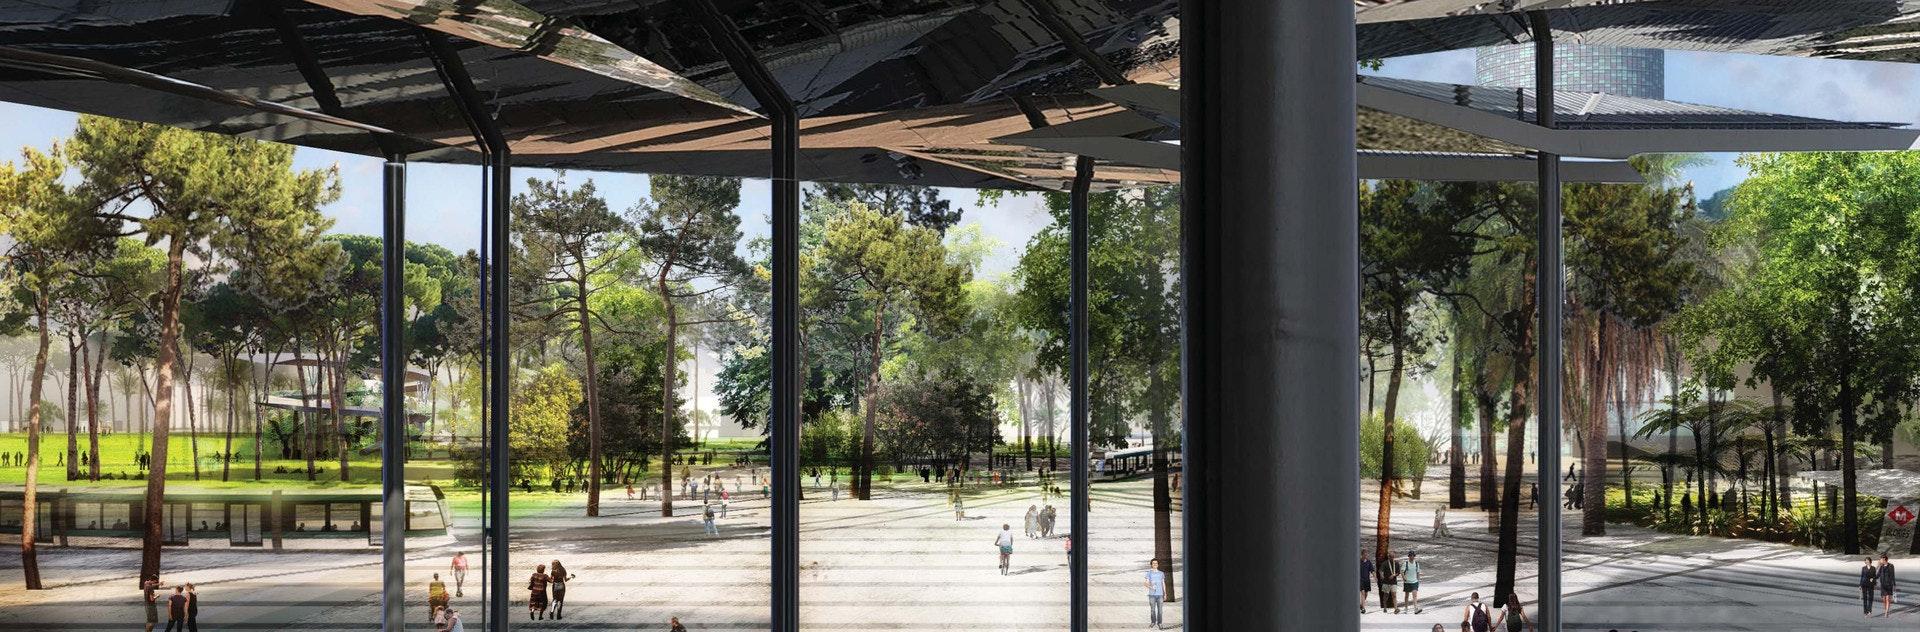 Status Under Construction Location Barcelona ES Firm Role Architect Additional Credits Agence Ter Landscape architect & URBAN CANOPY BARCELONA (SP) | YTAU Yannick Troubat Architecture ...